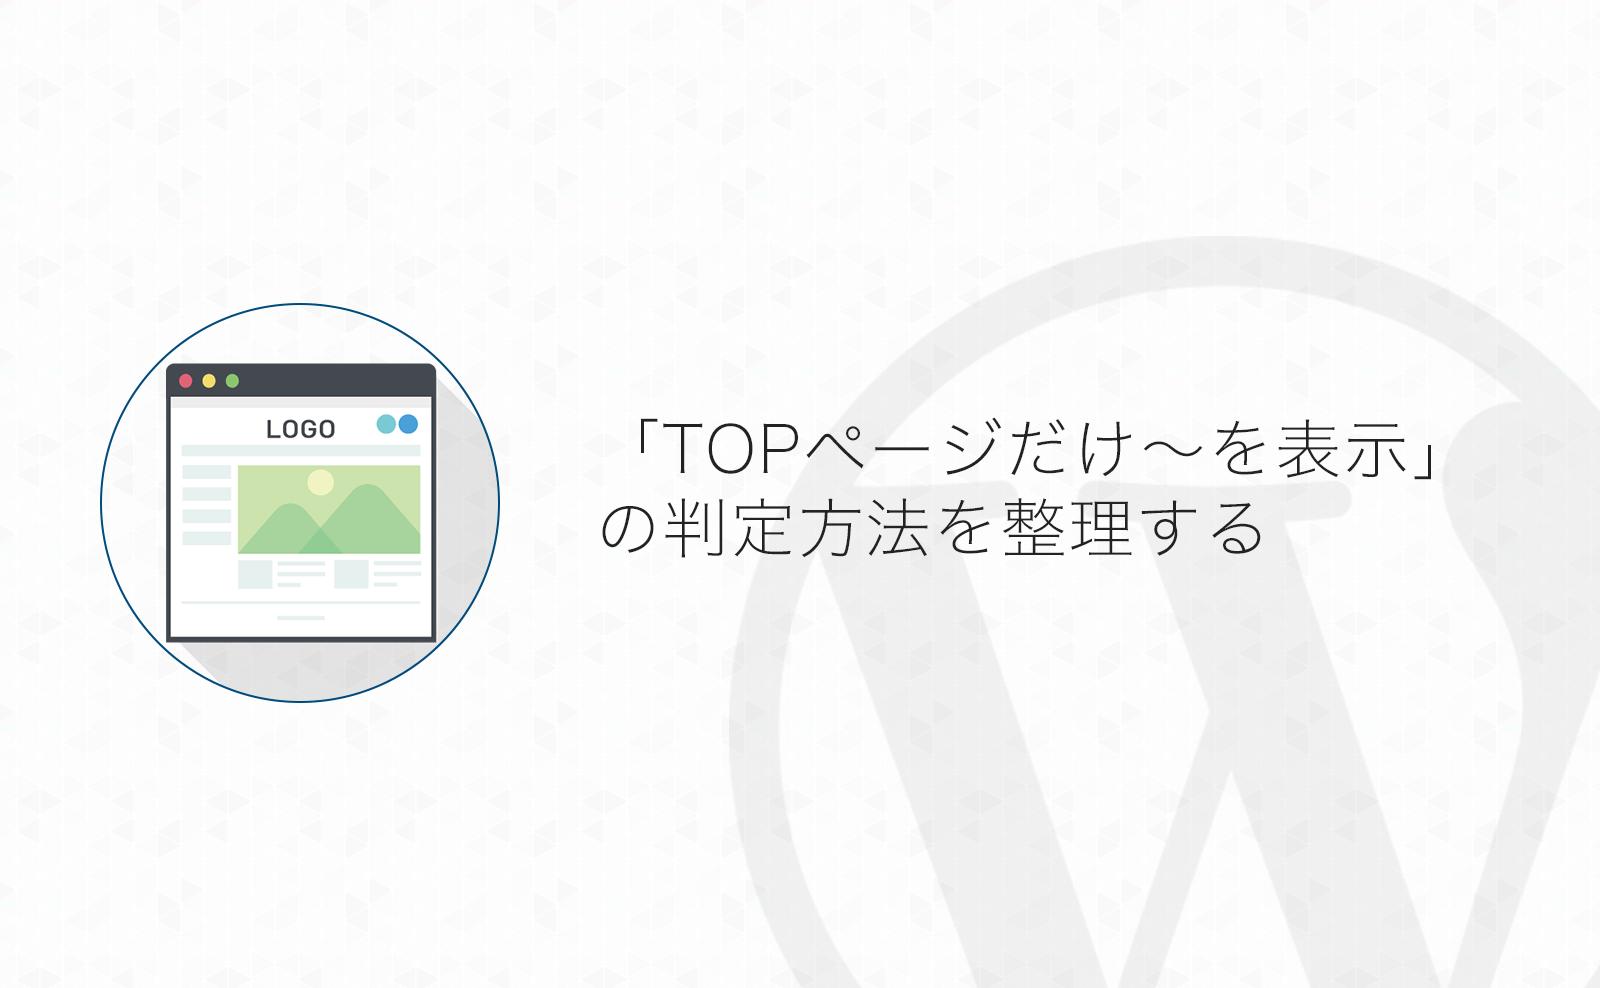 【WordPress】「TOPページだけ〜を表示したい」カスタマイズの為の条件分岐を整理してみる